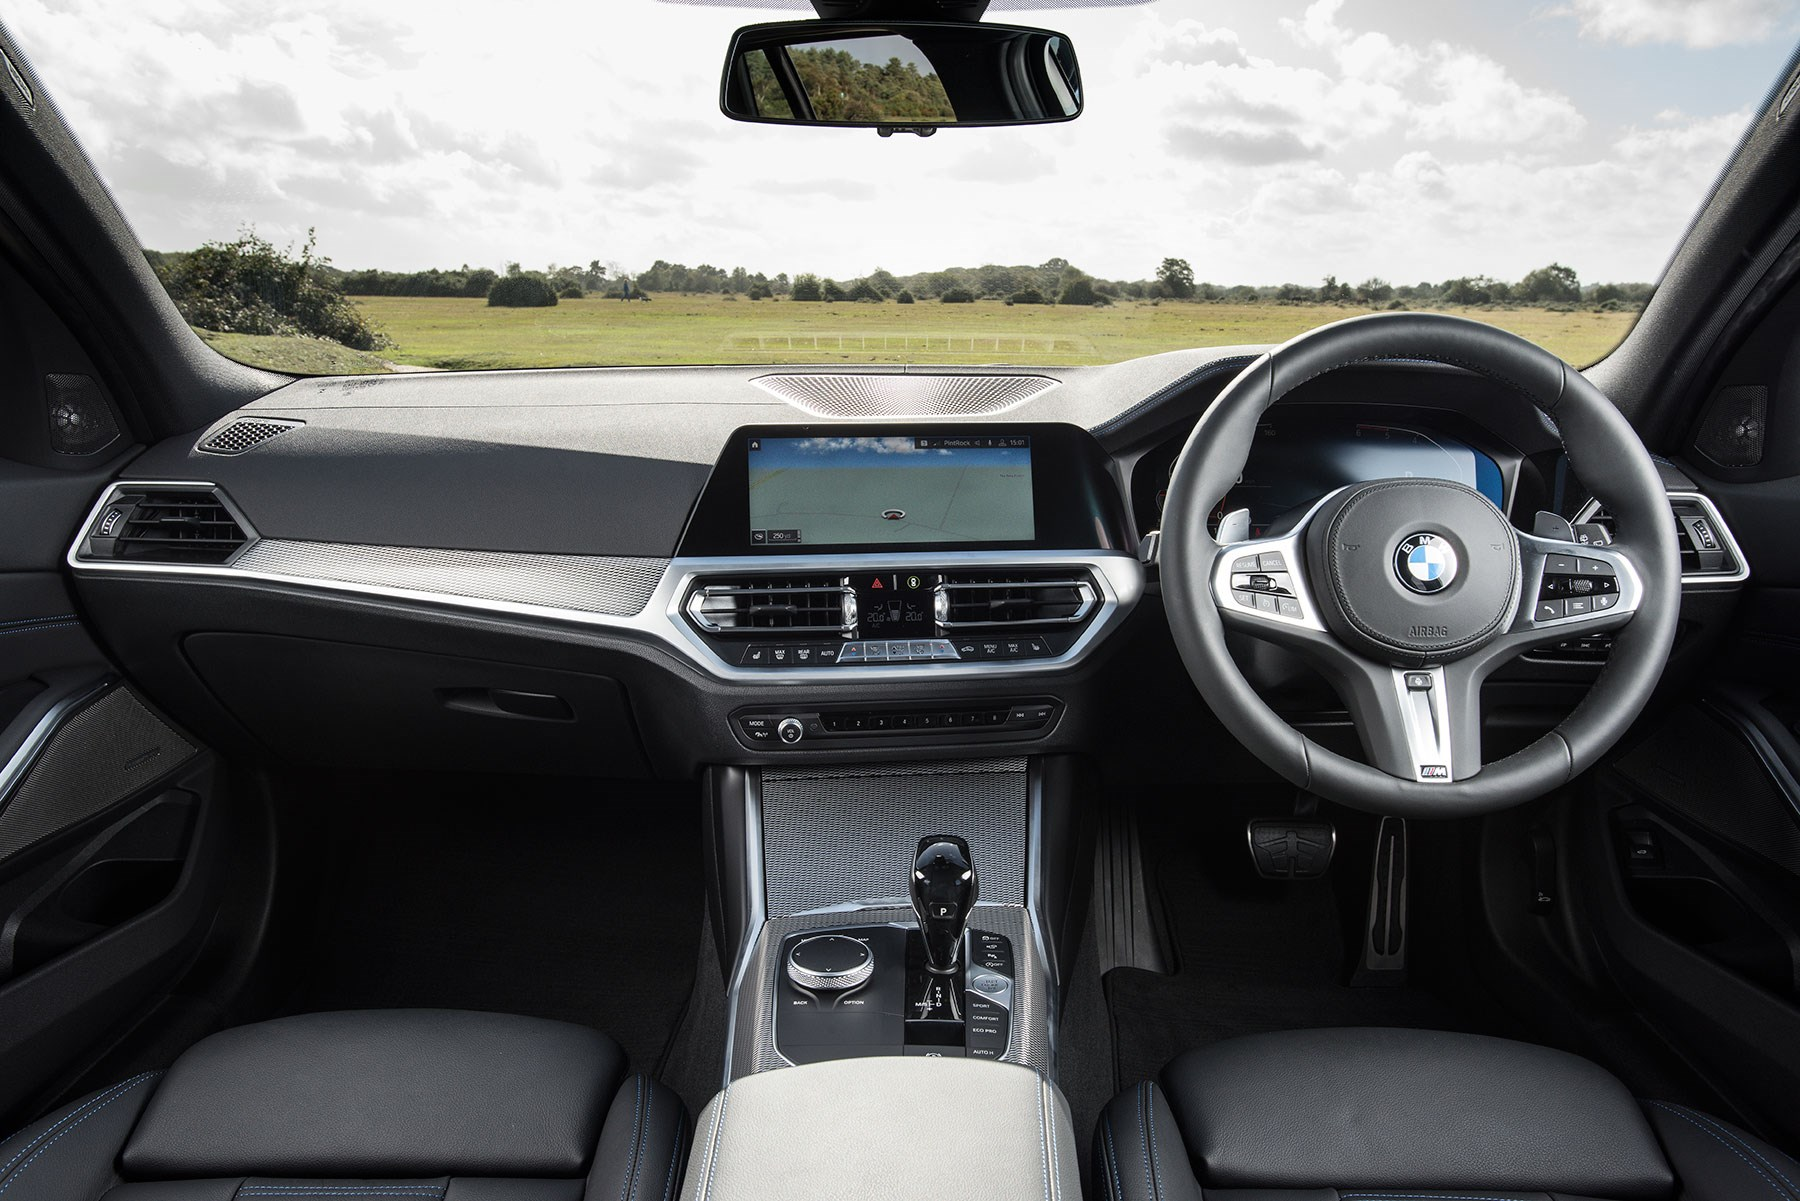 BMW 3-series Touring estate interior